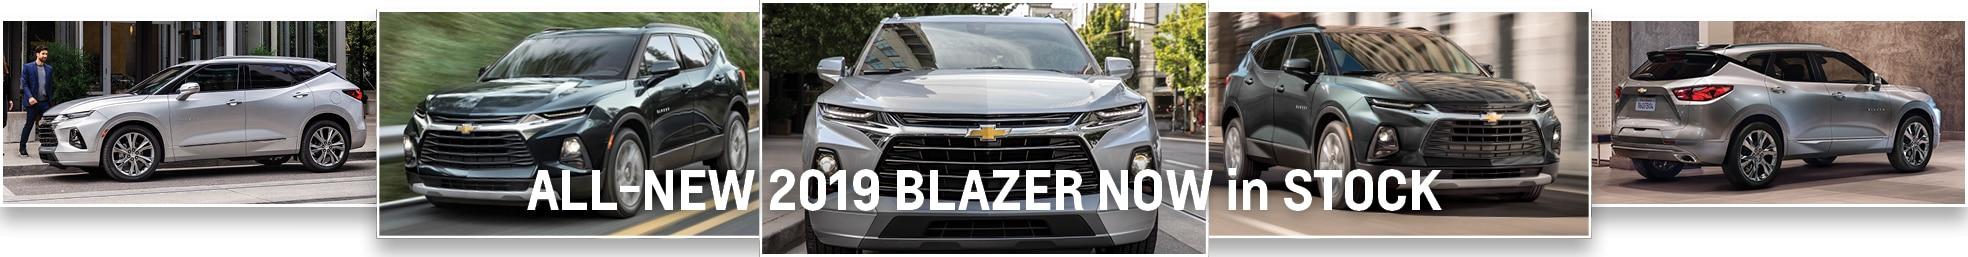 Chevy Dealer   New & Used Cars, Trucks & SUVs   Scottsdale AZ